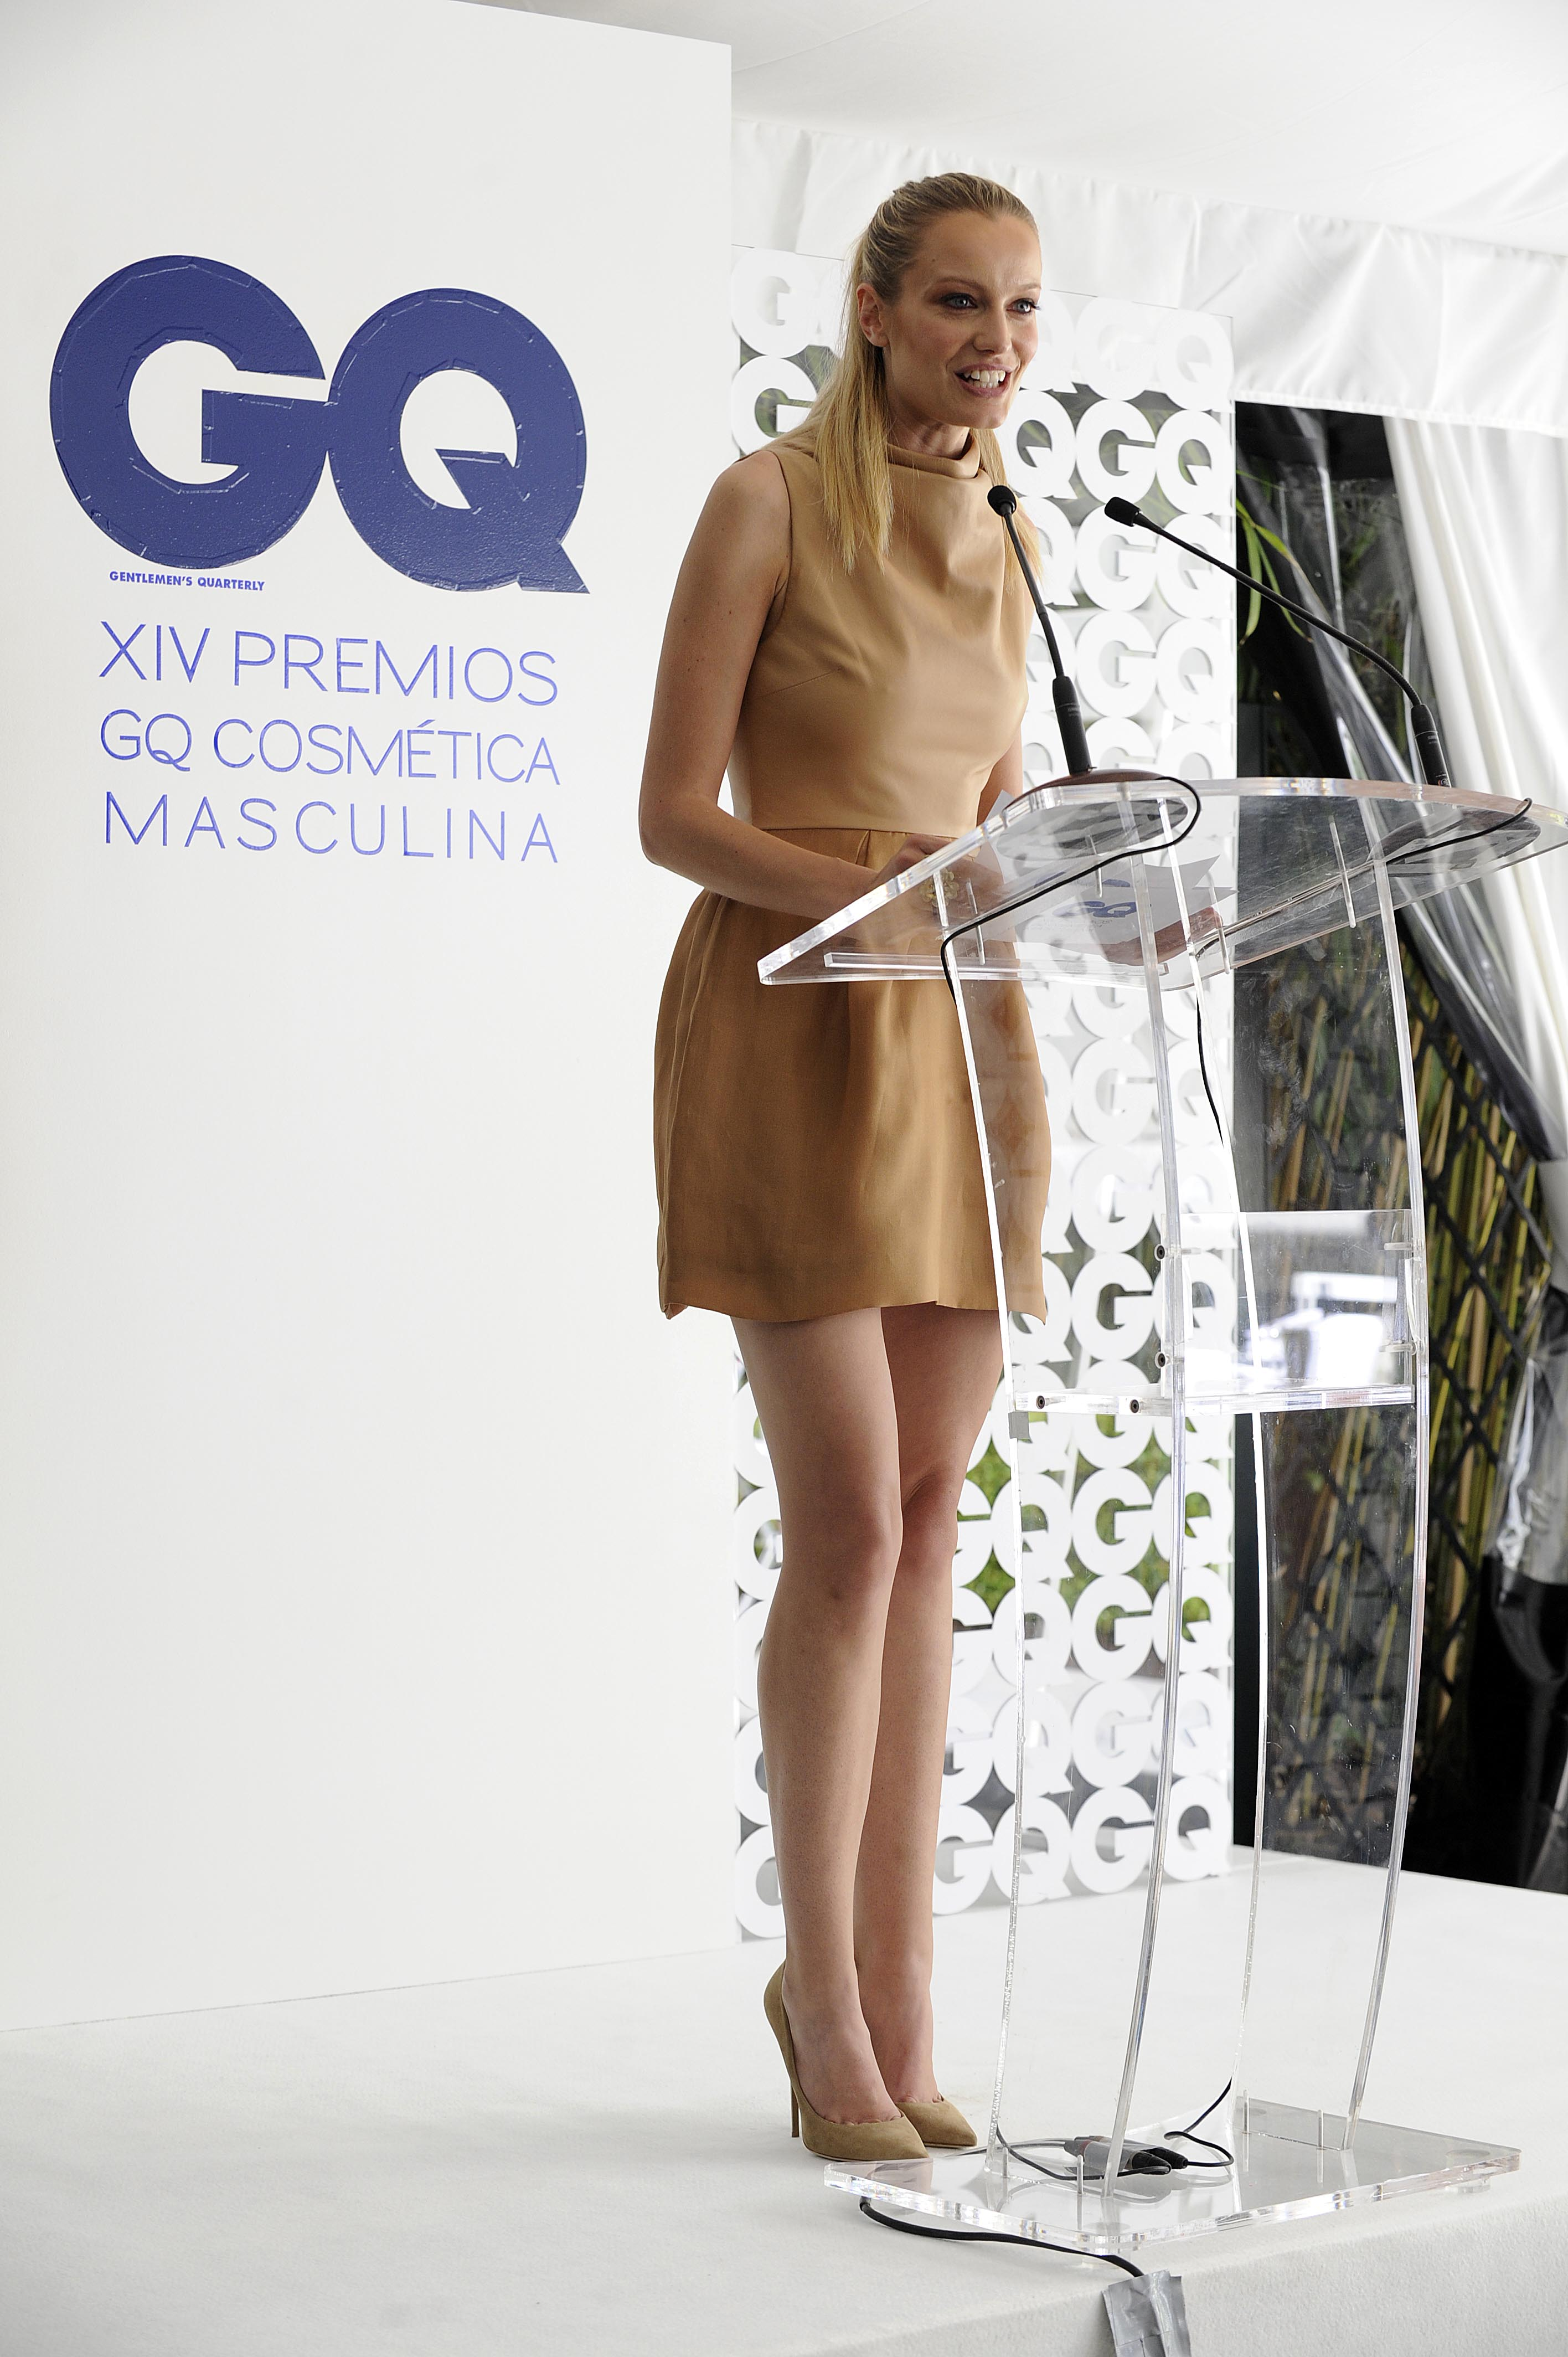 Renata Zanchi - GQ Man Beauty Awards 2012